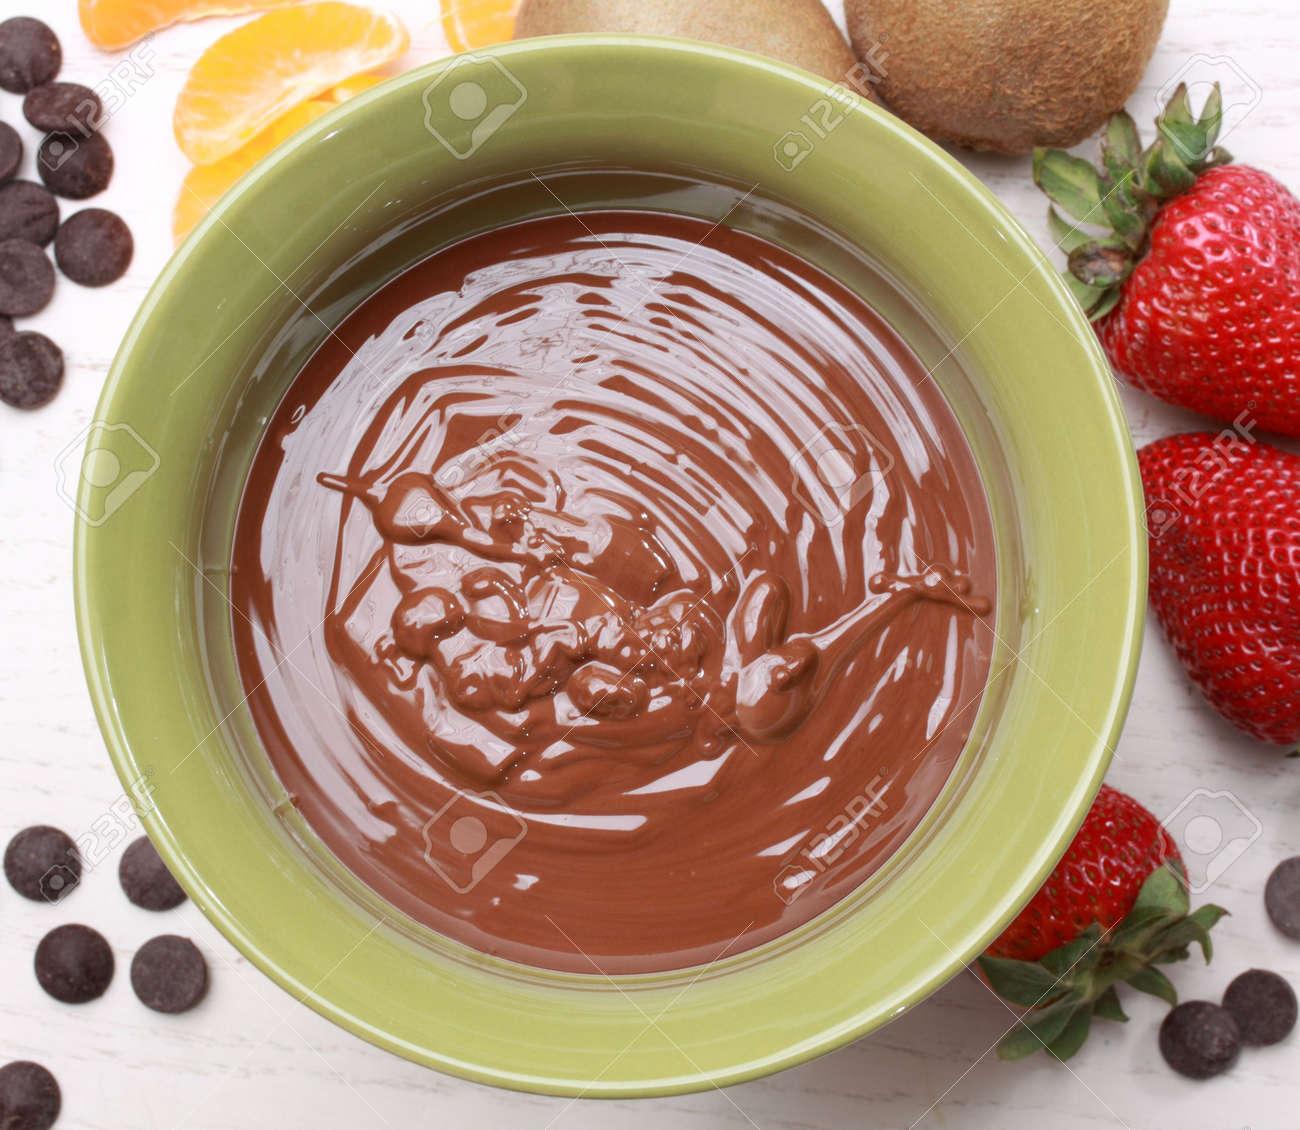 chocolate fondue kit and fresh fruit, beige background Stock Photo - 4900574